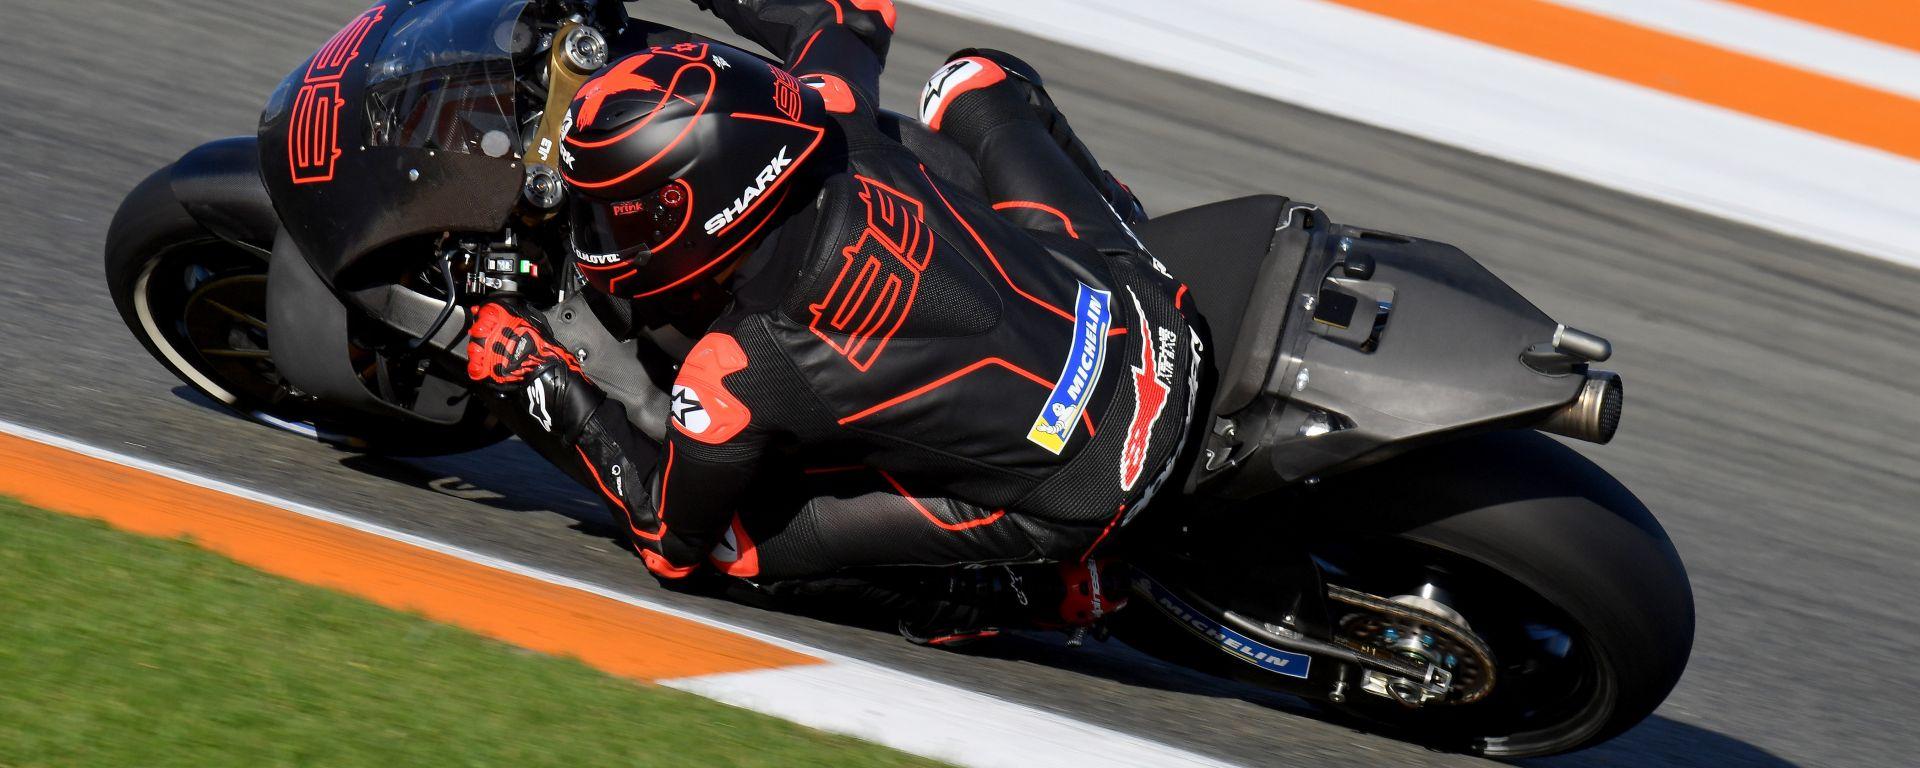 Shark  sponsor ufficiale del MotoGP di Le Mans fino al 2021